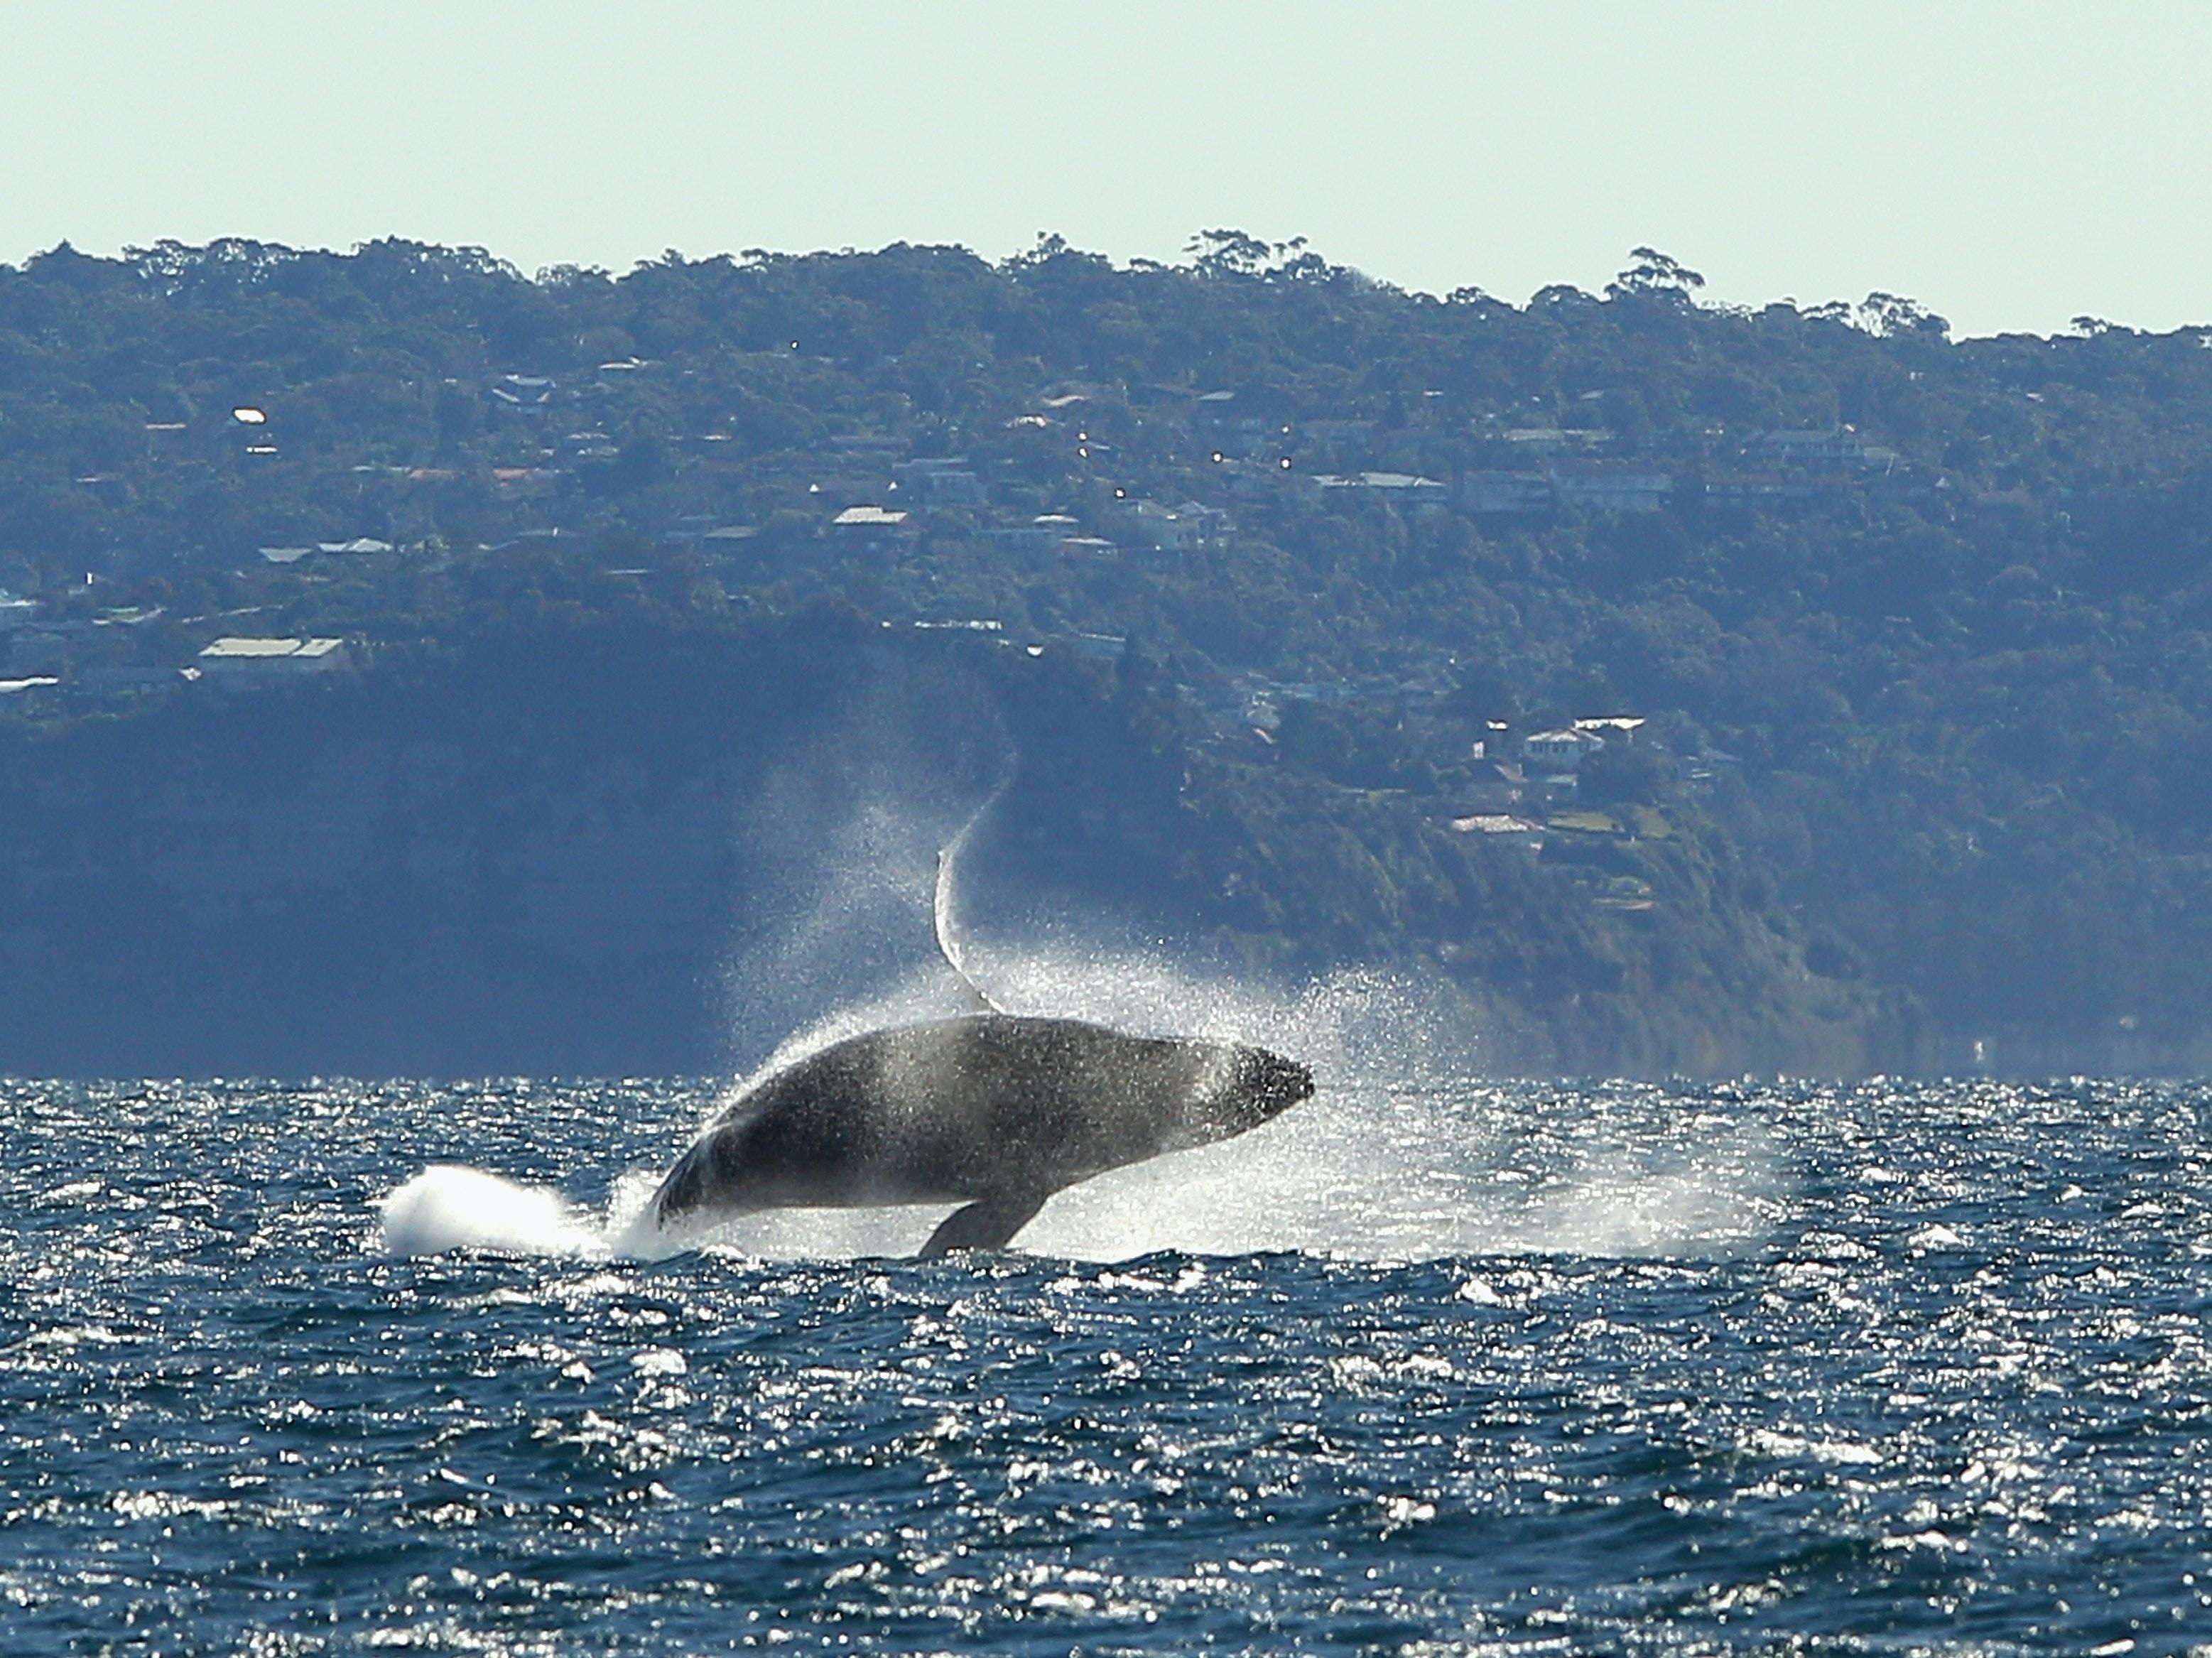 A humpback whale breaches near Sydney, Australia.